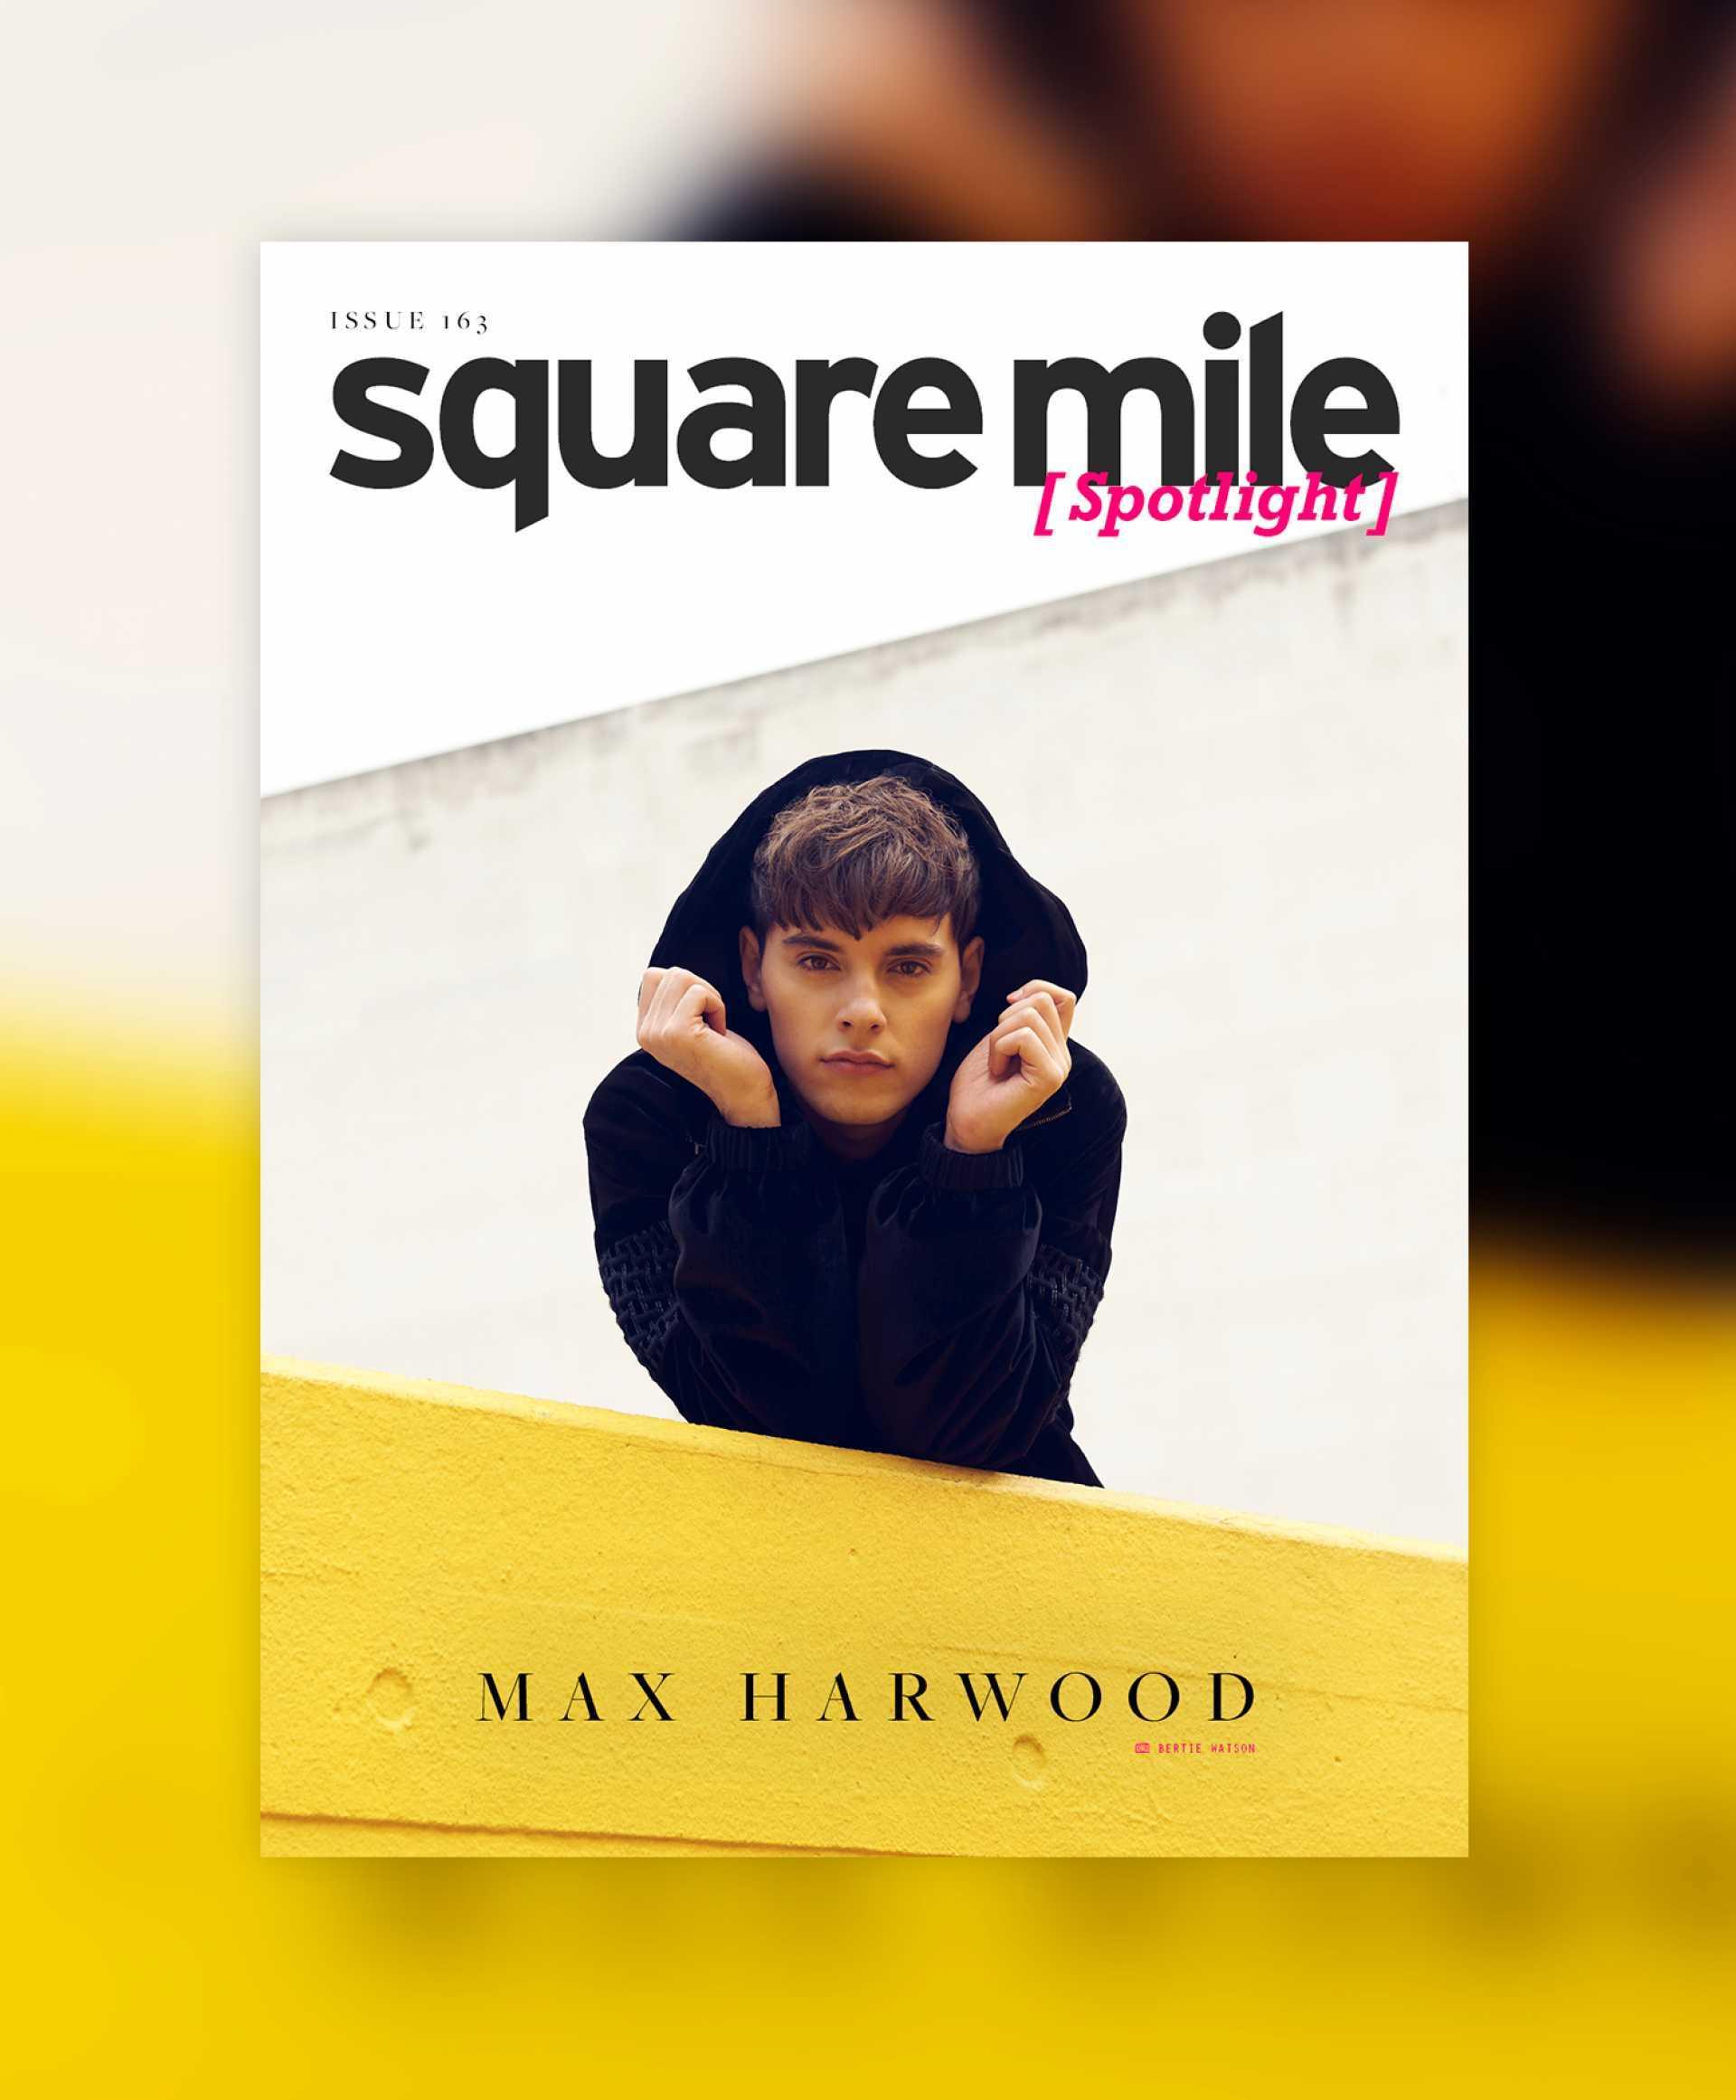 Max Harwood